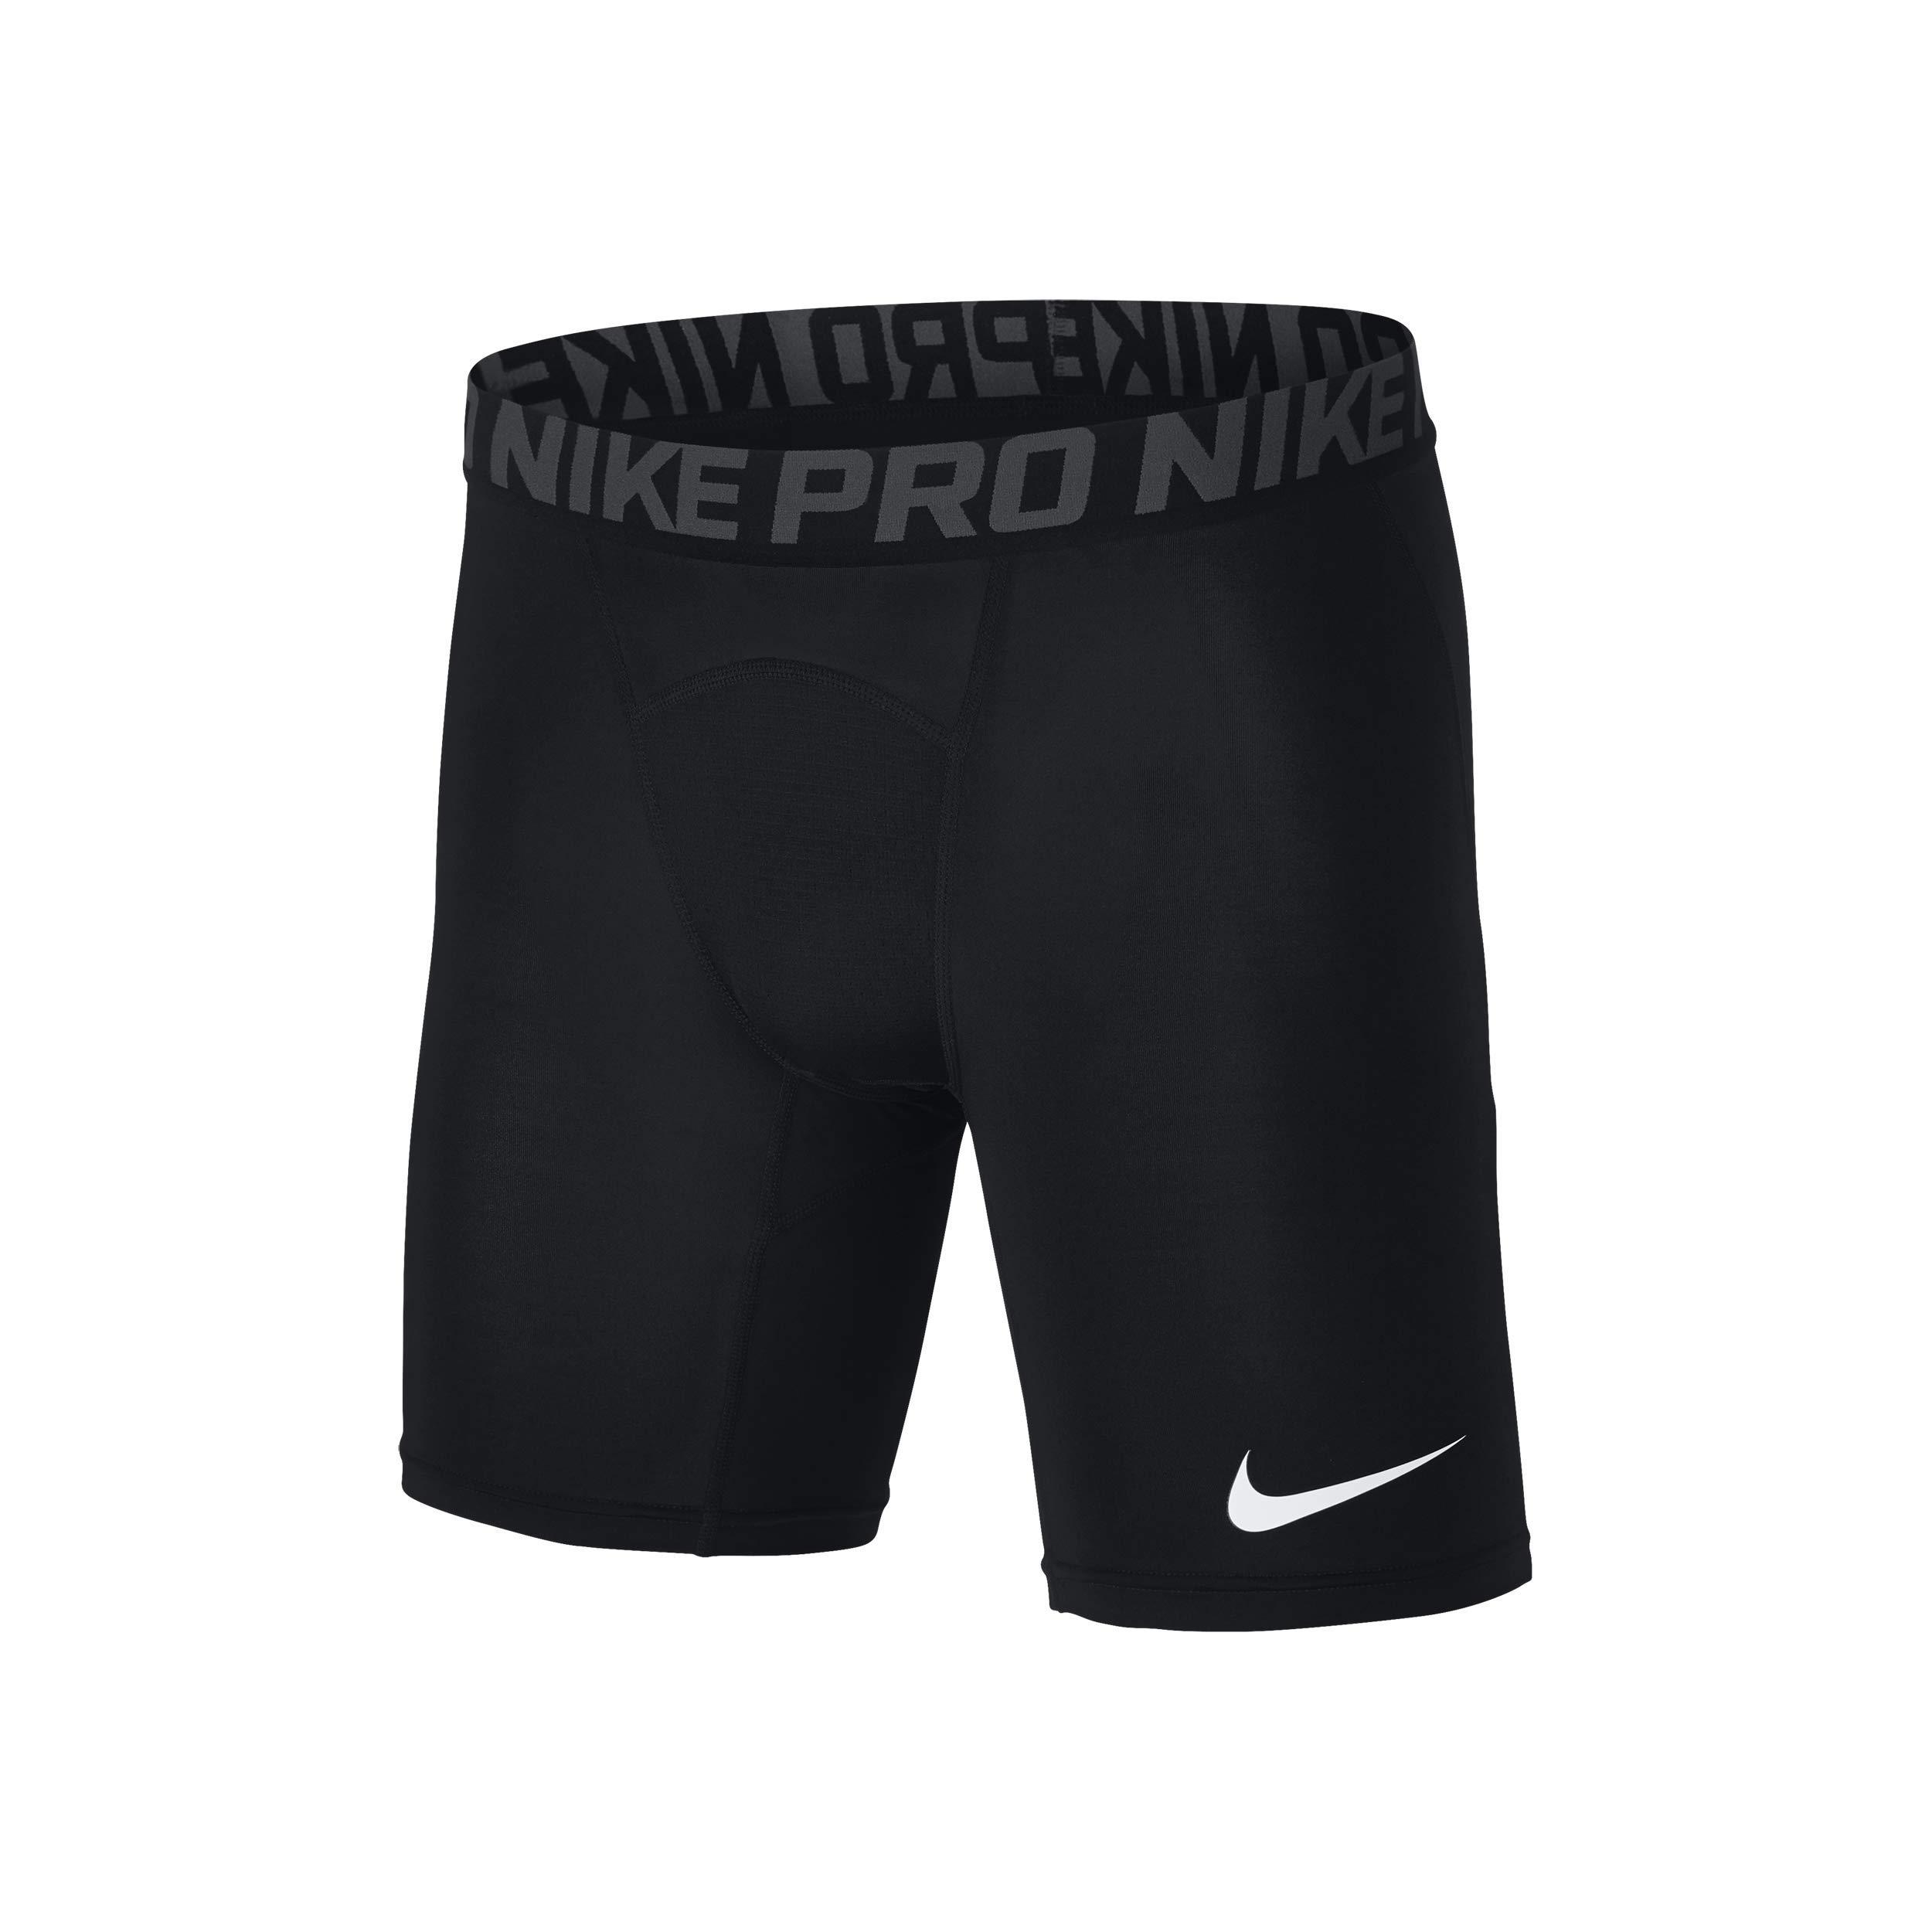 Nike 838061 010, Shorts Uomo FACESHOPPING